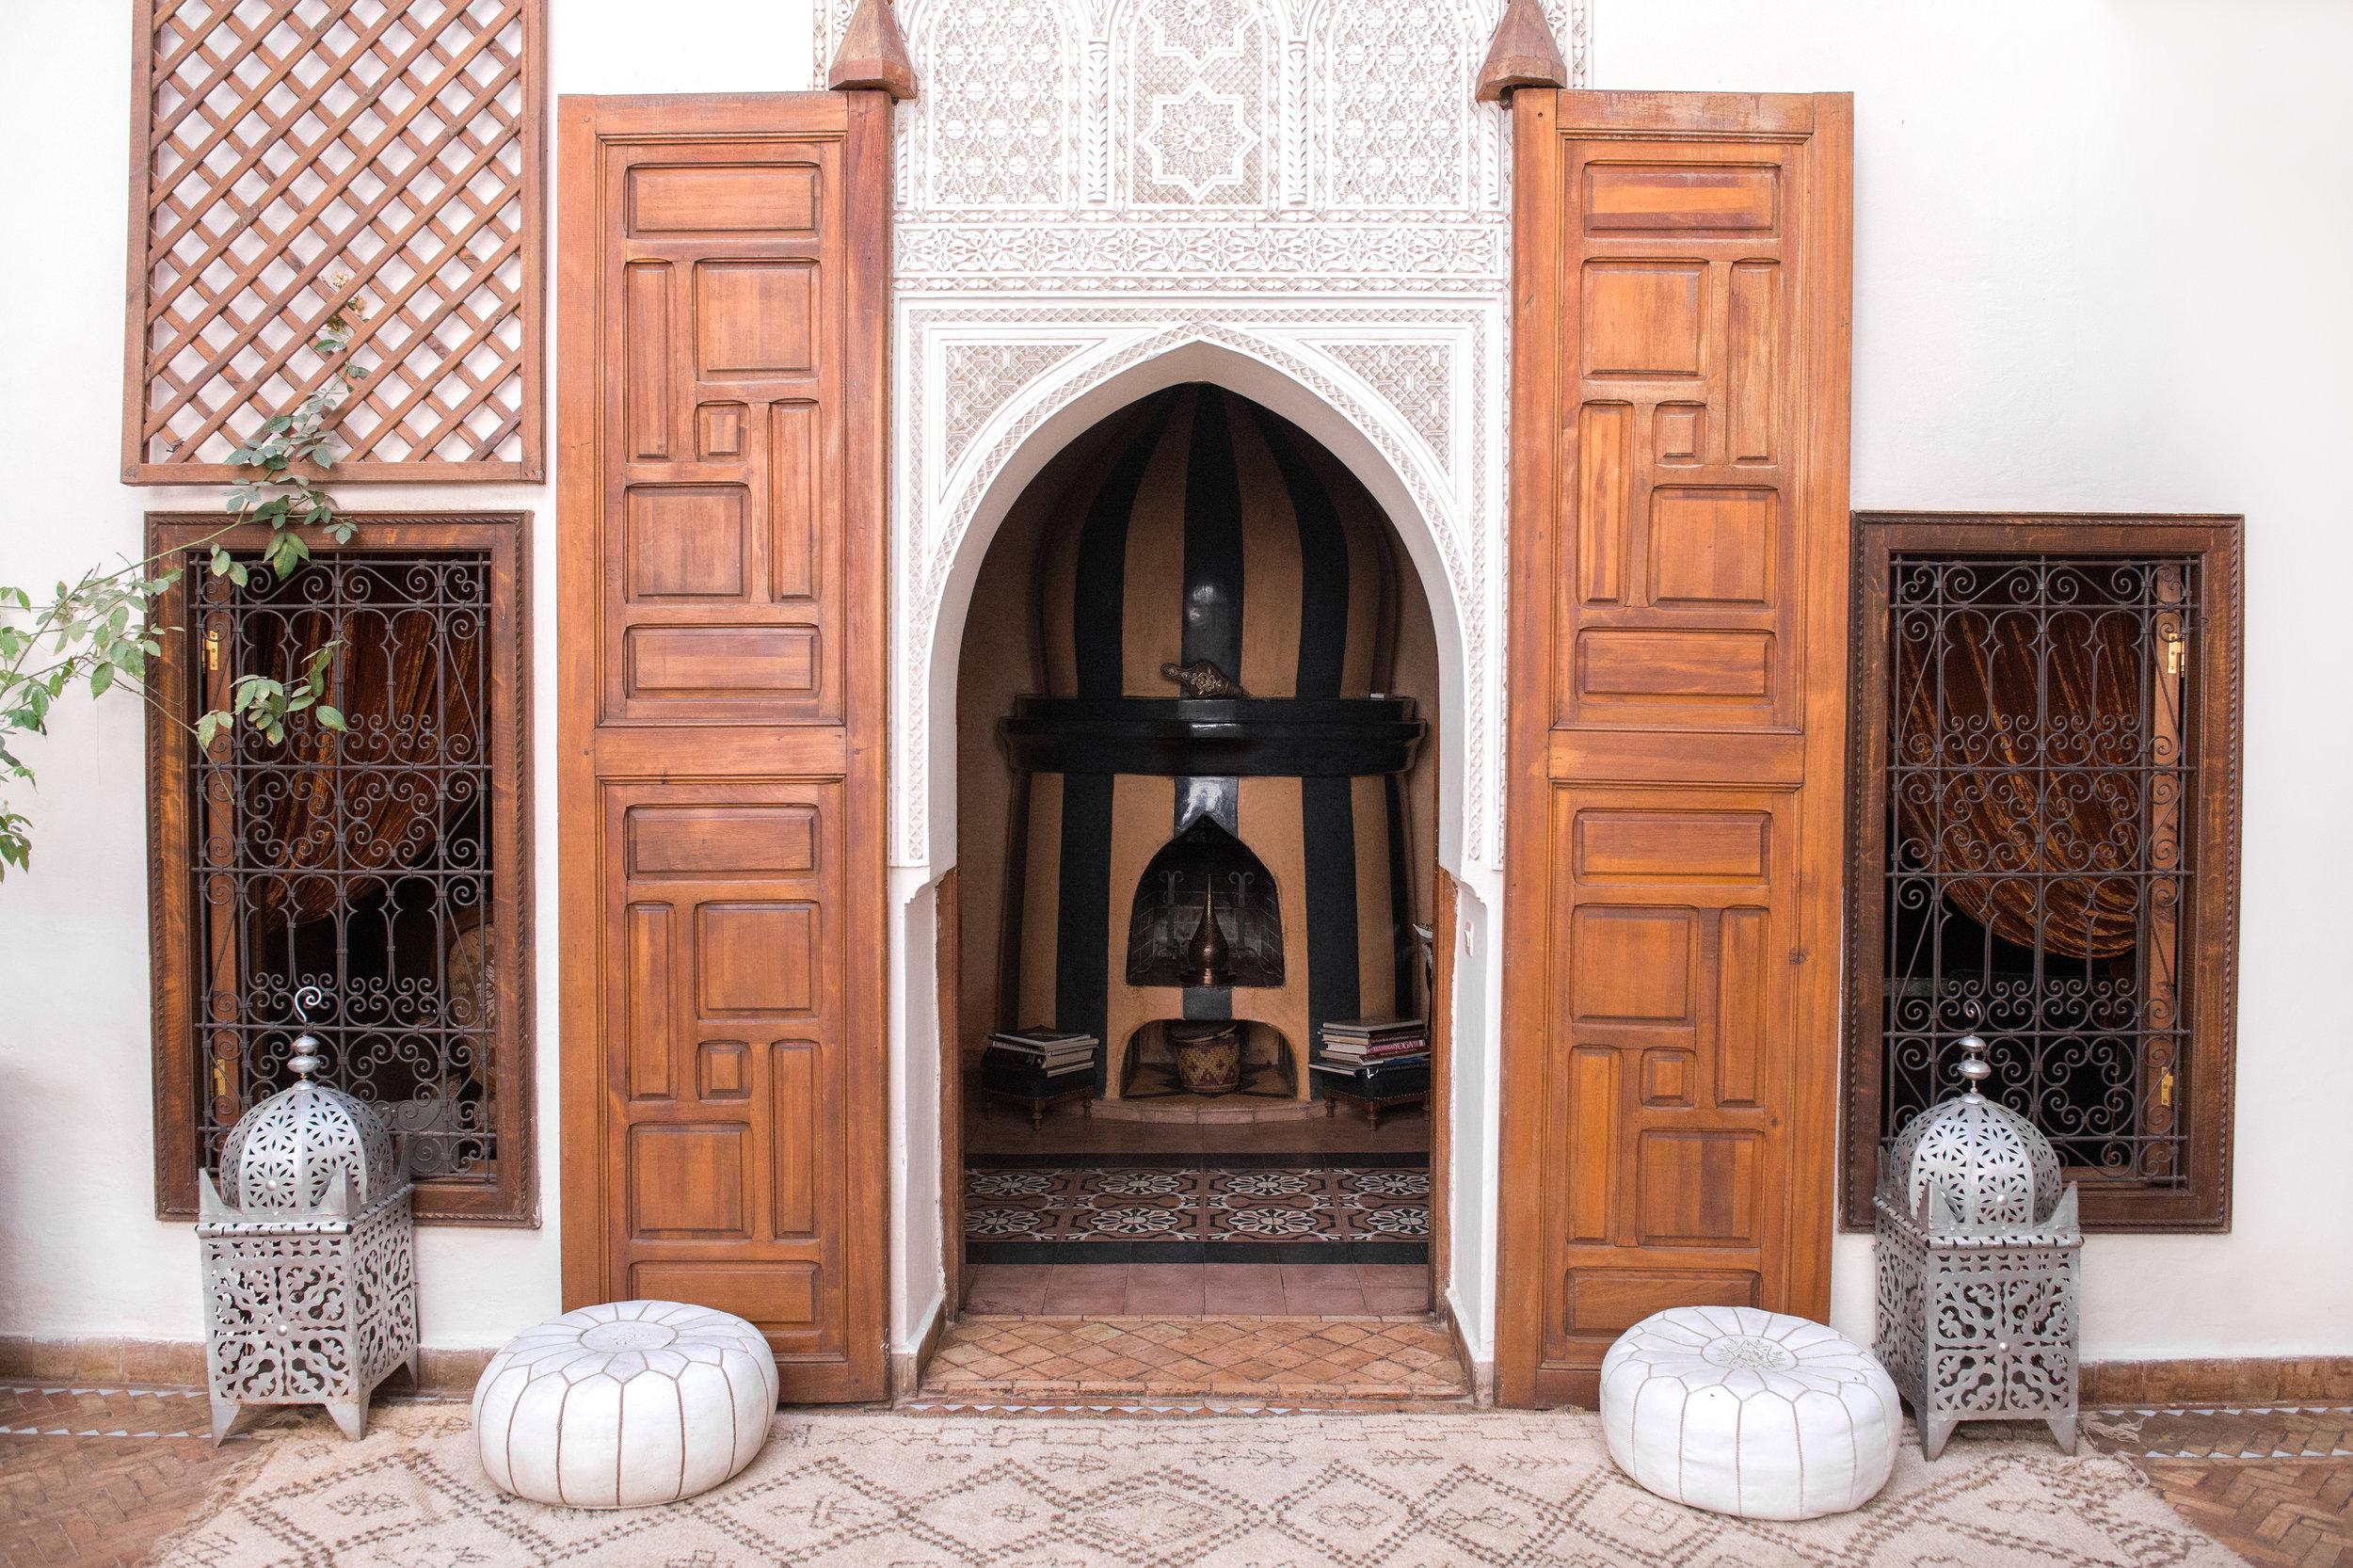 riad-zamzam-marrakech-spa-morocco-luxury-holiday-03